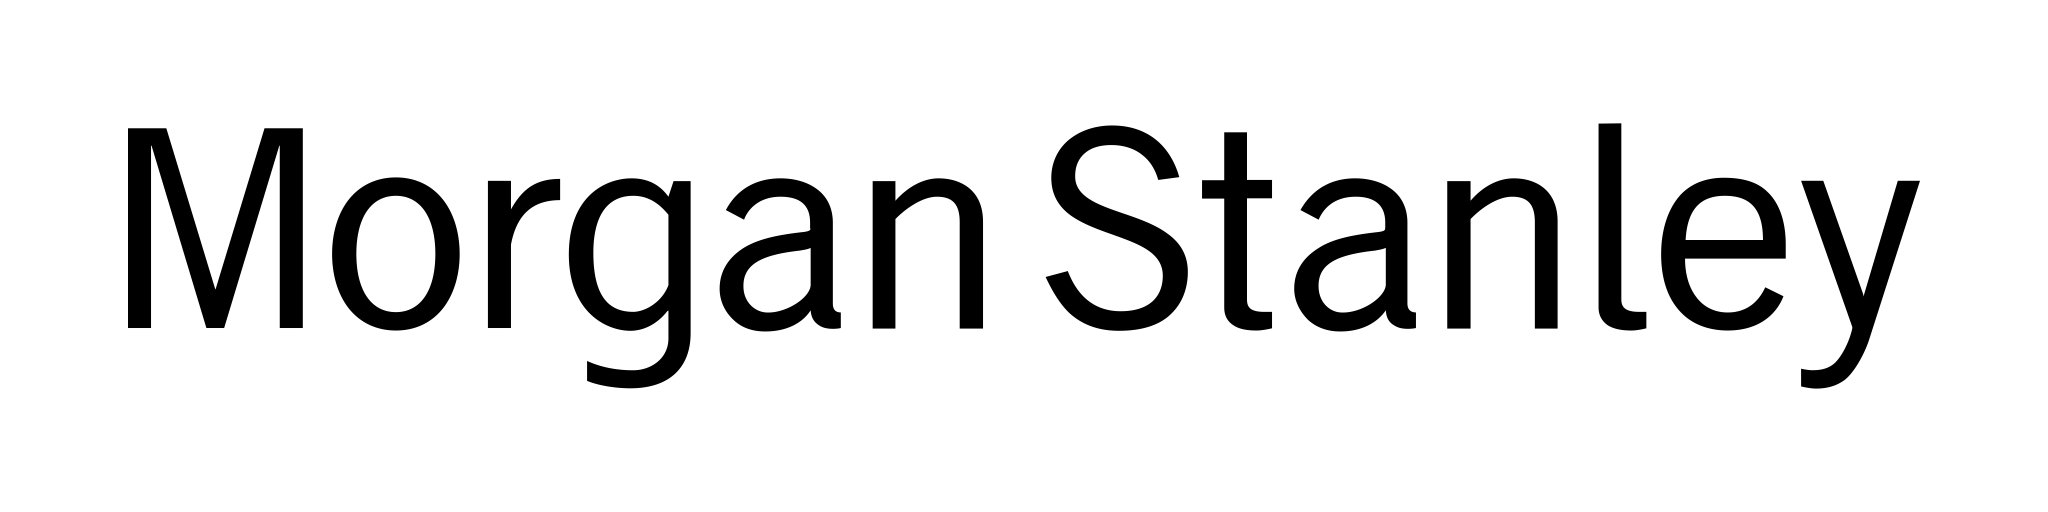 Morgan Stanley Logo transparent PNG.